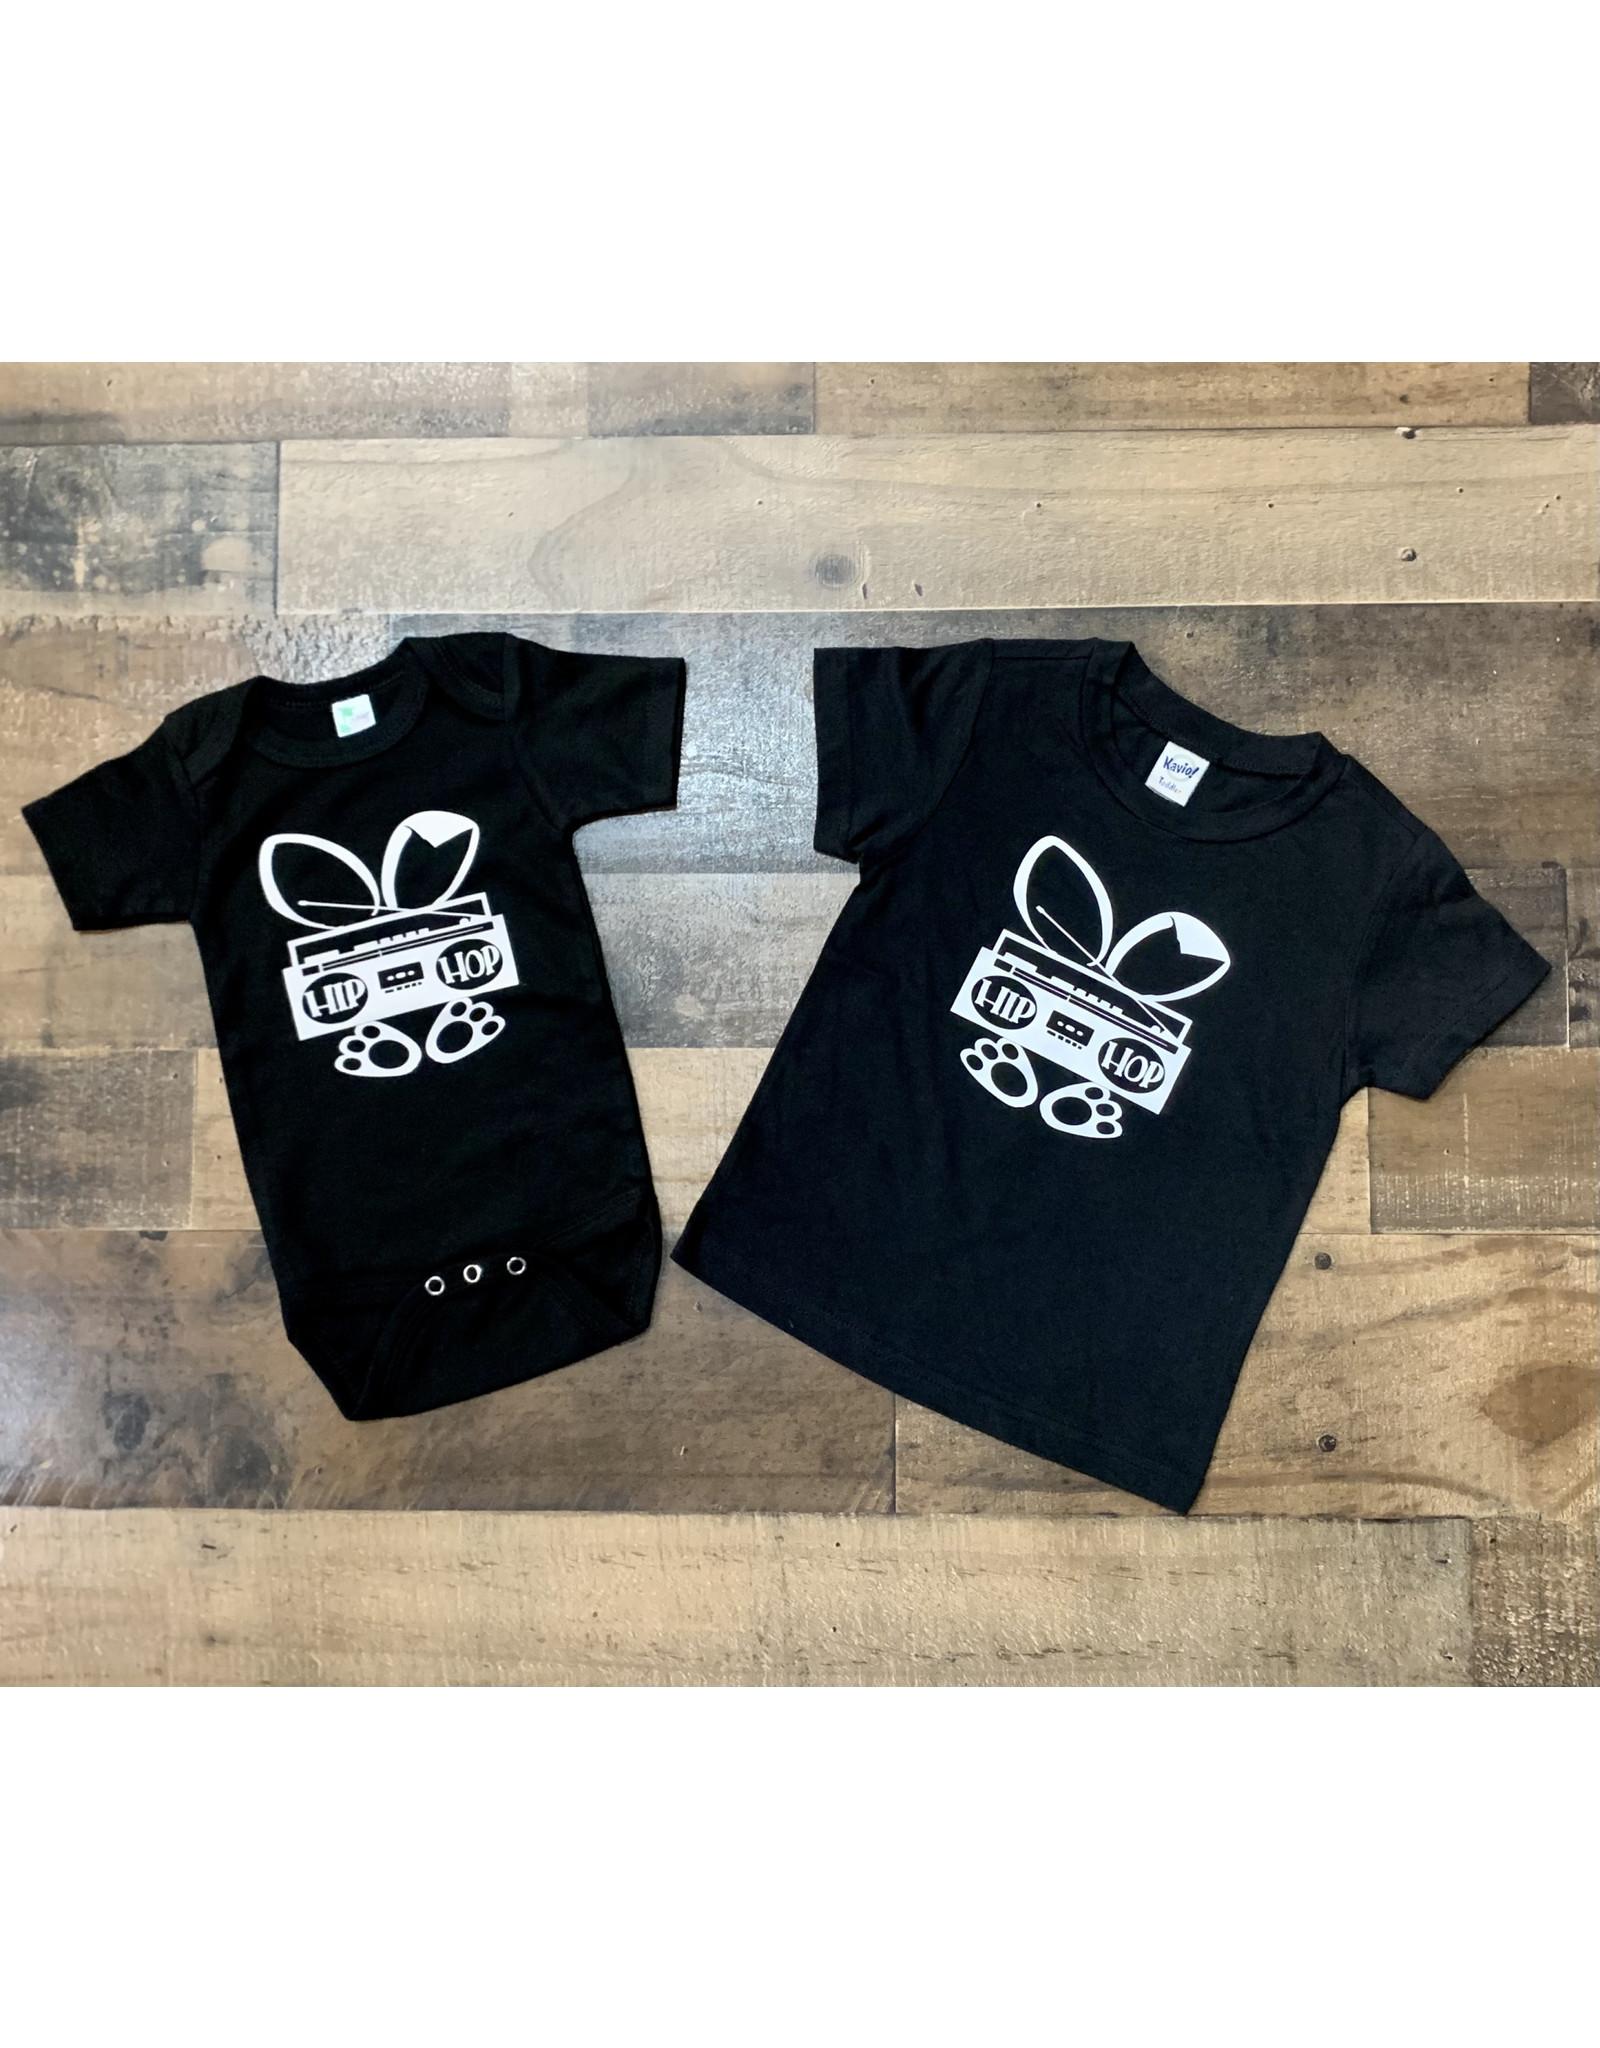 Hip Hop Bunny Blk/Wht